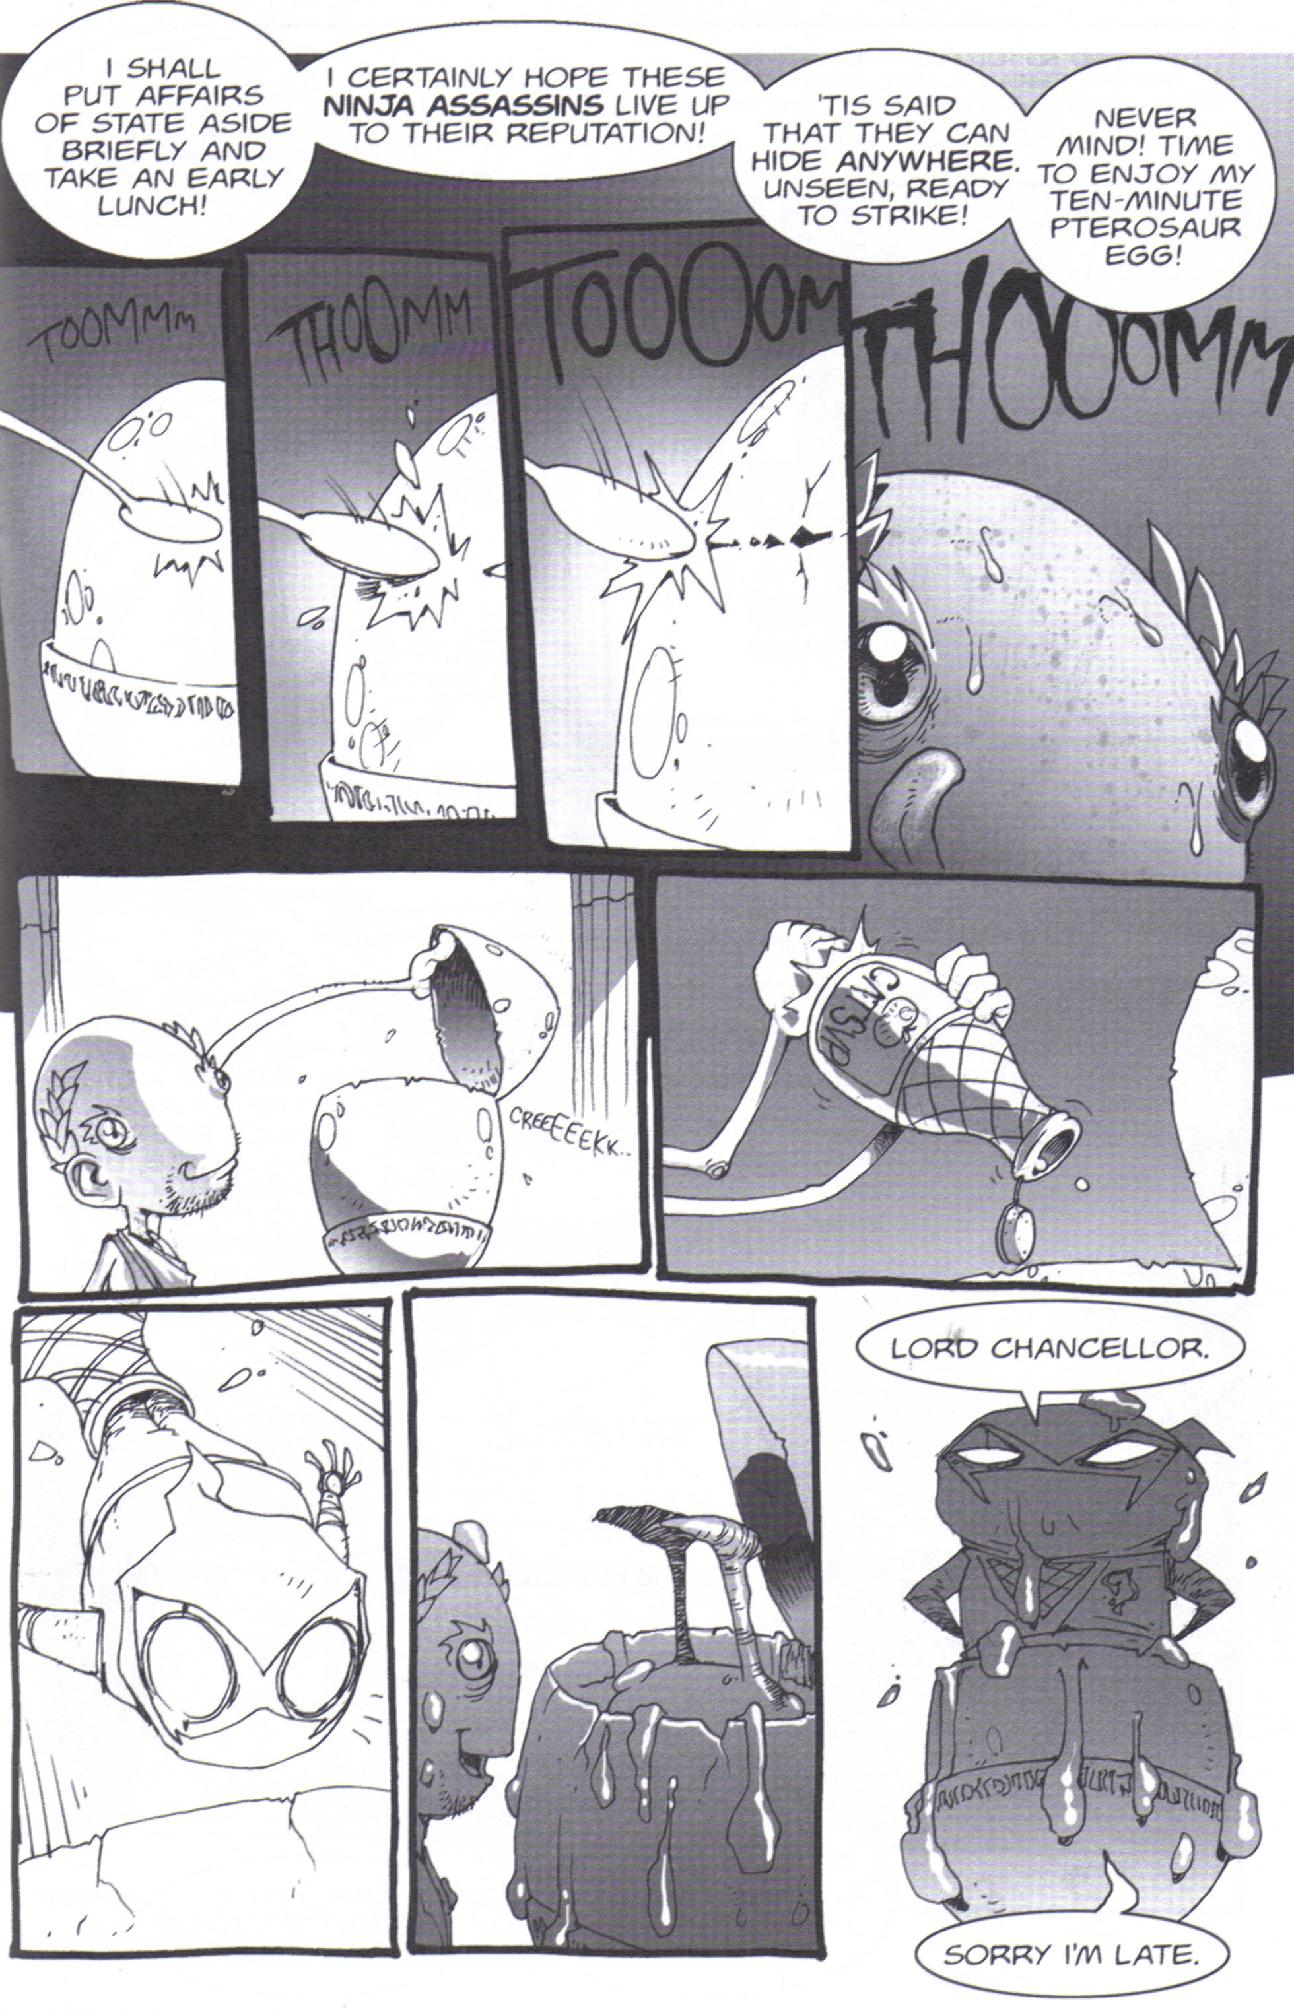 Read online Pirates vs. Ninjas: Global Harming comic -  Issue # Full - 5